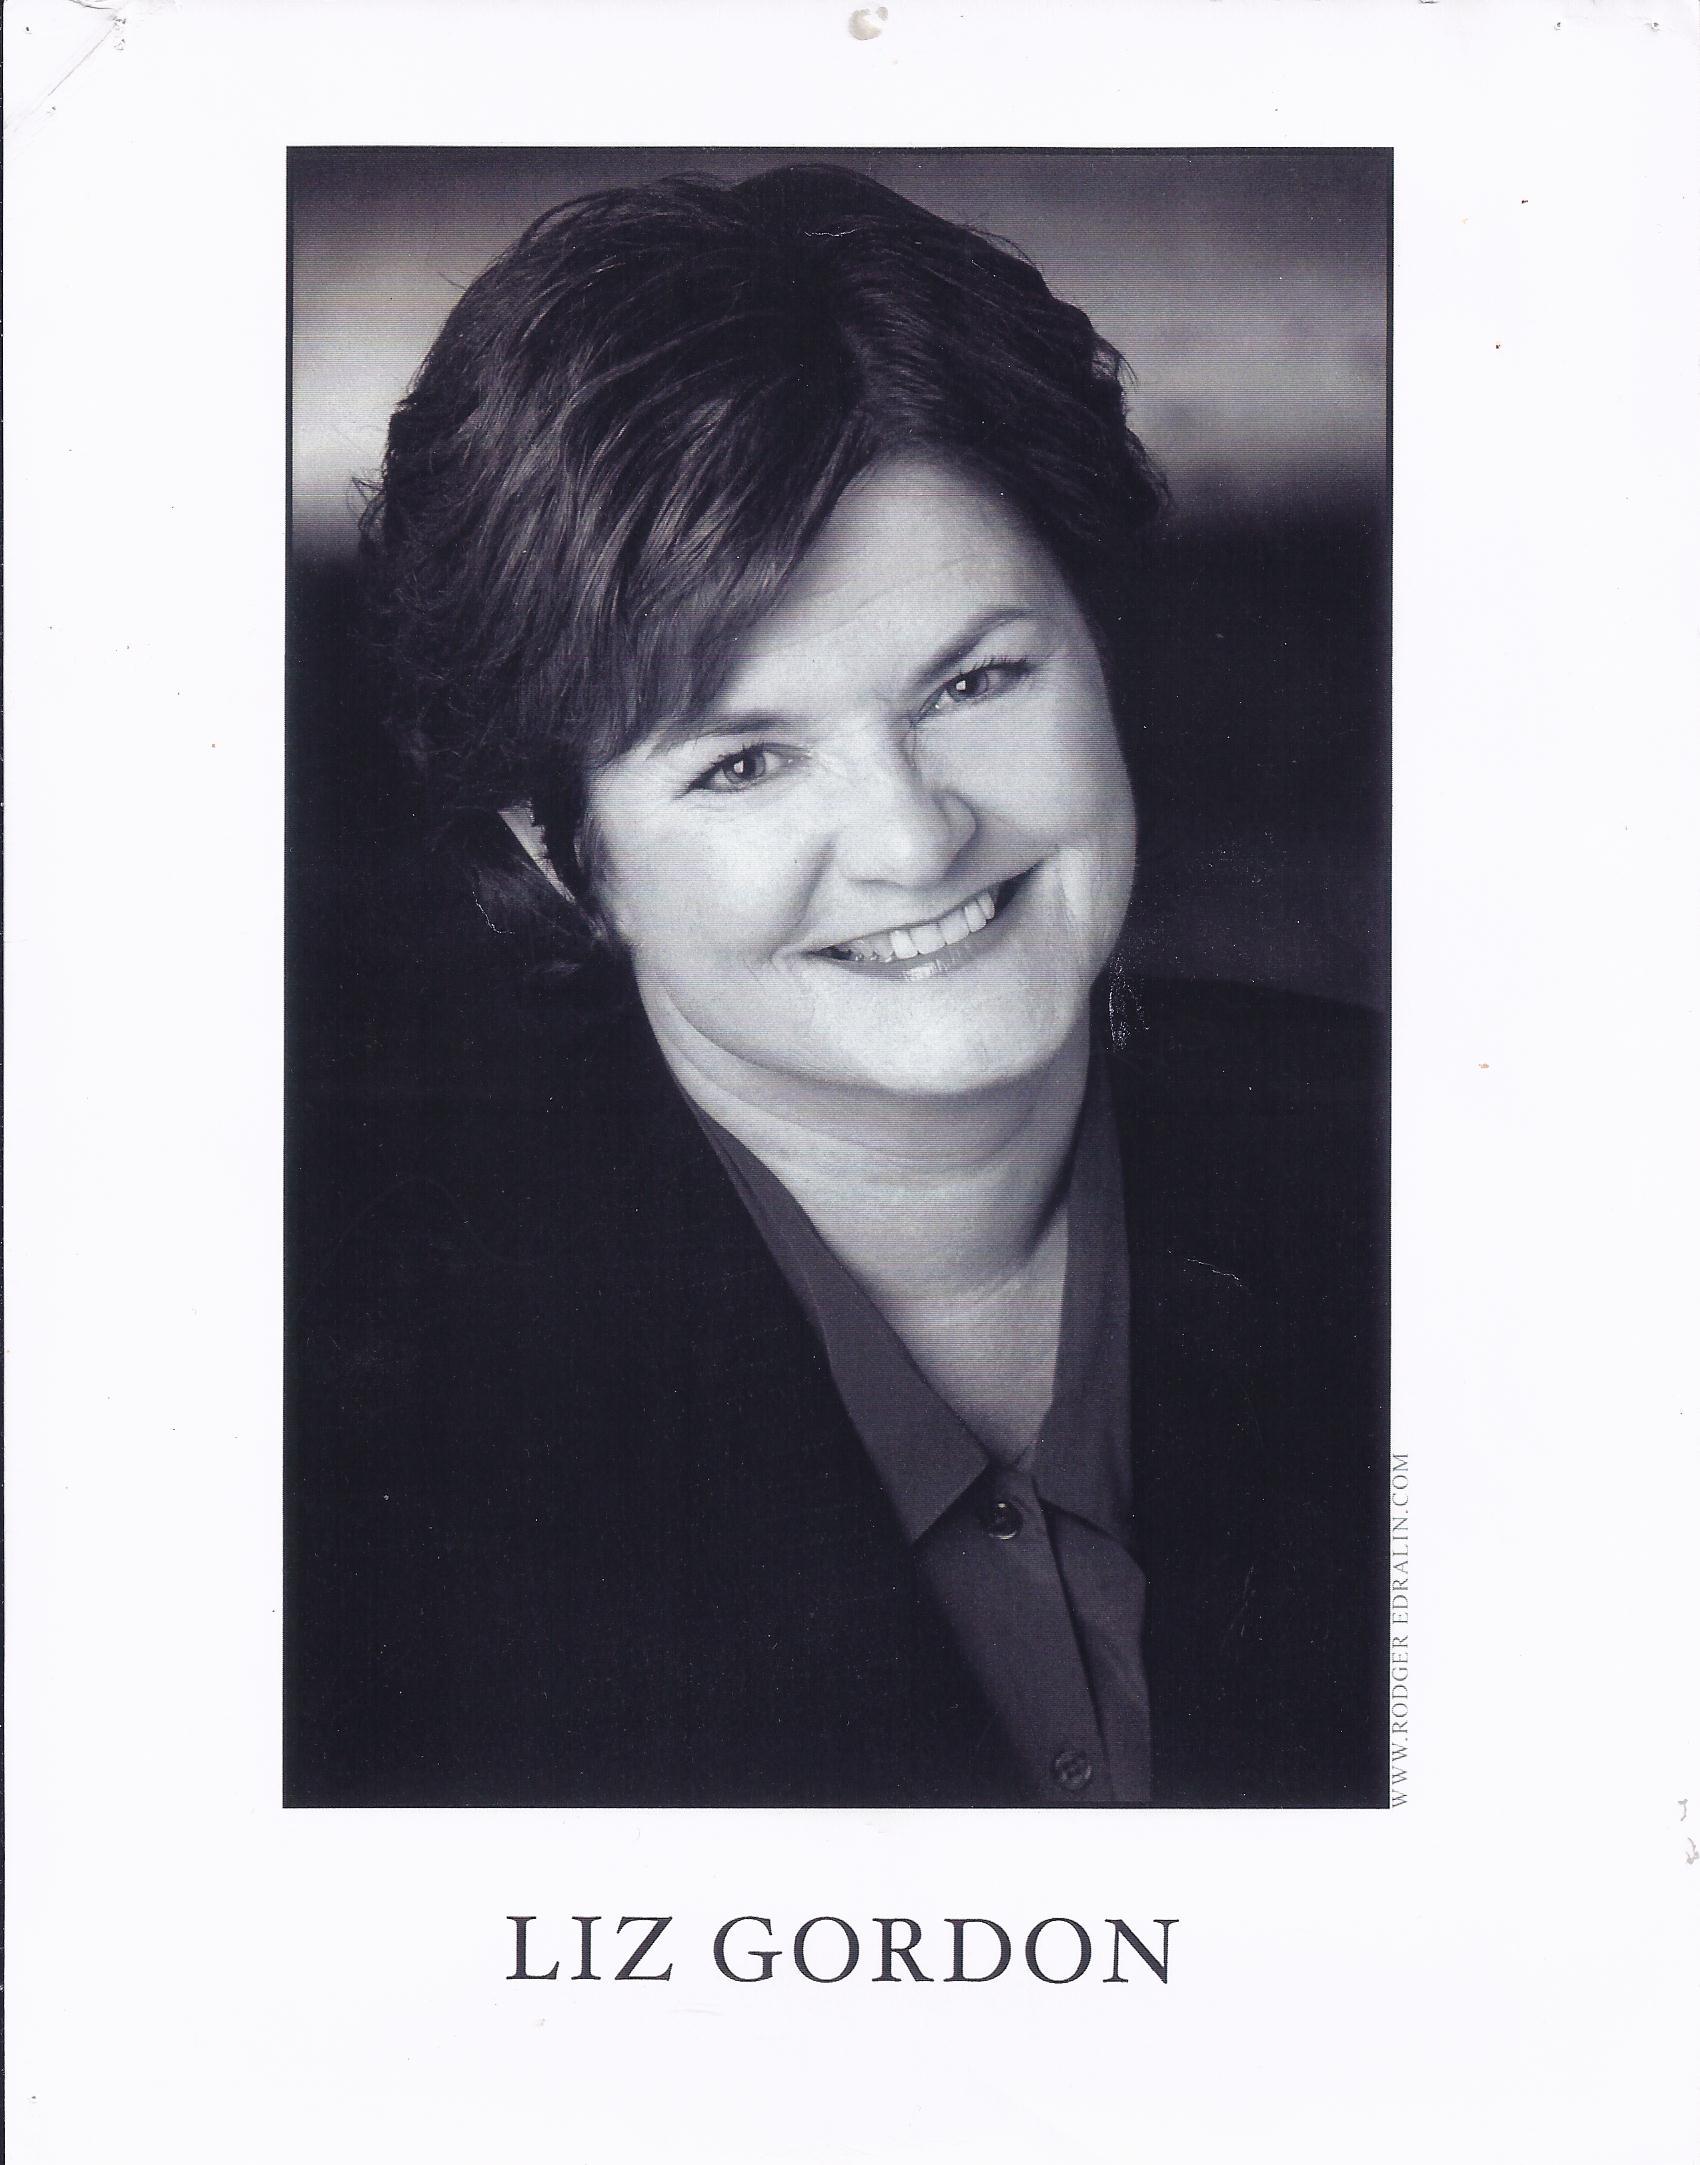 Liz Gordon